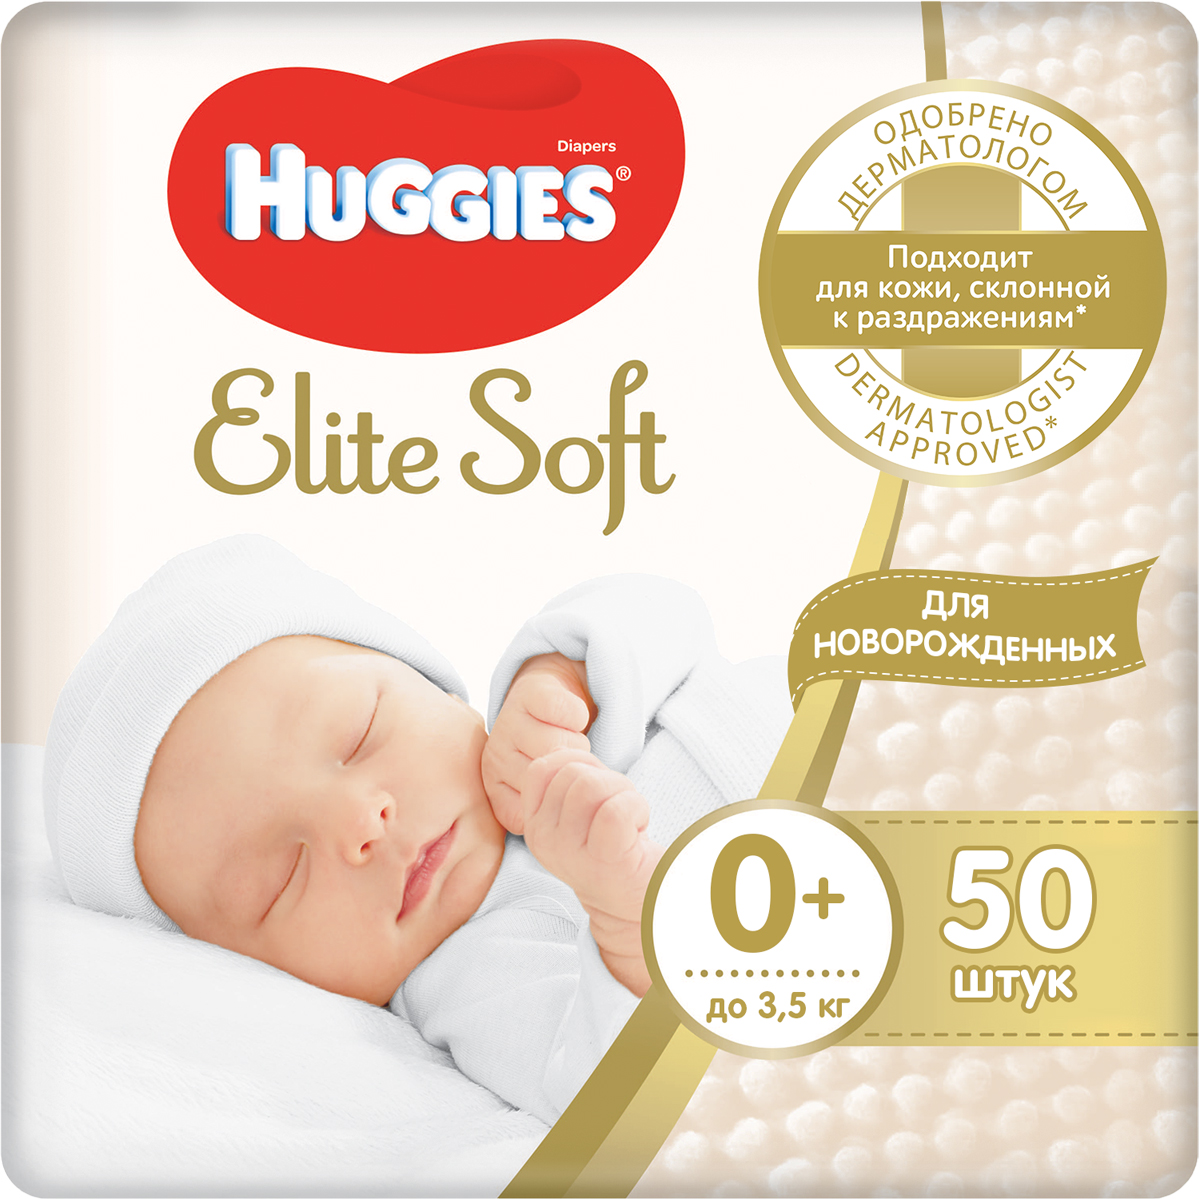 Подгузники Huggies, 0+, до 3,5 кг, 9400128, 50 шт